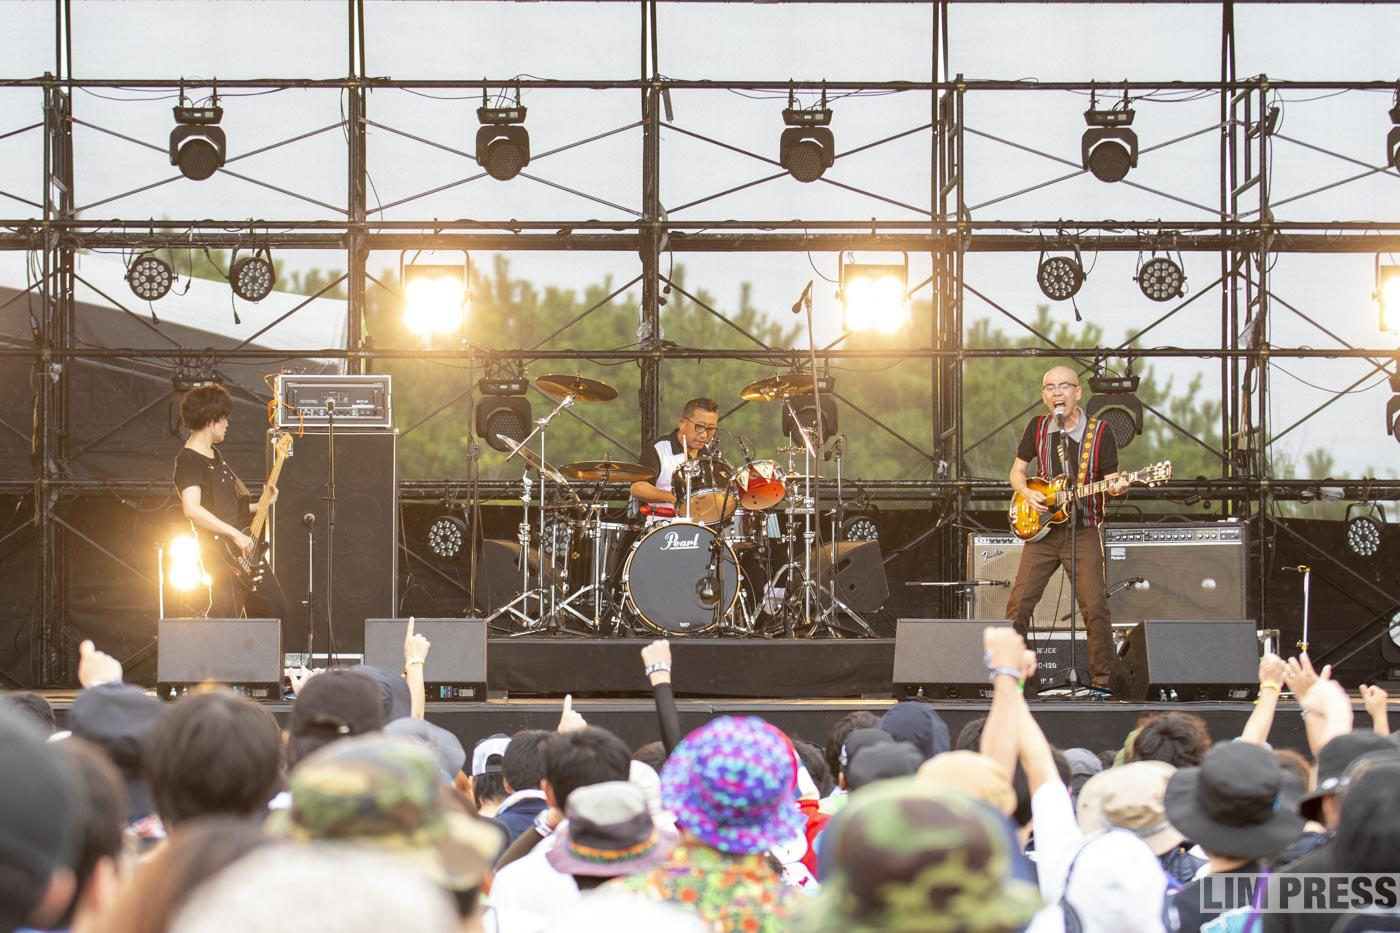 eastern youth | 山口 WILD BUNCH FEST. | 2019.08.24